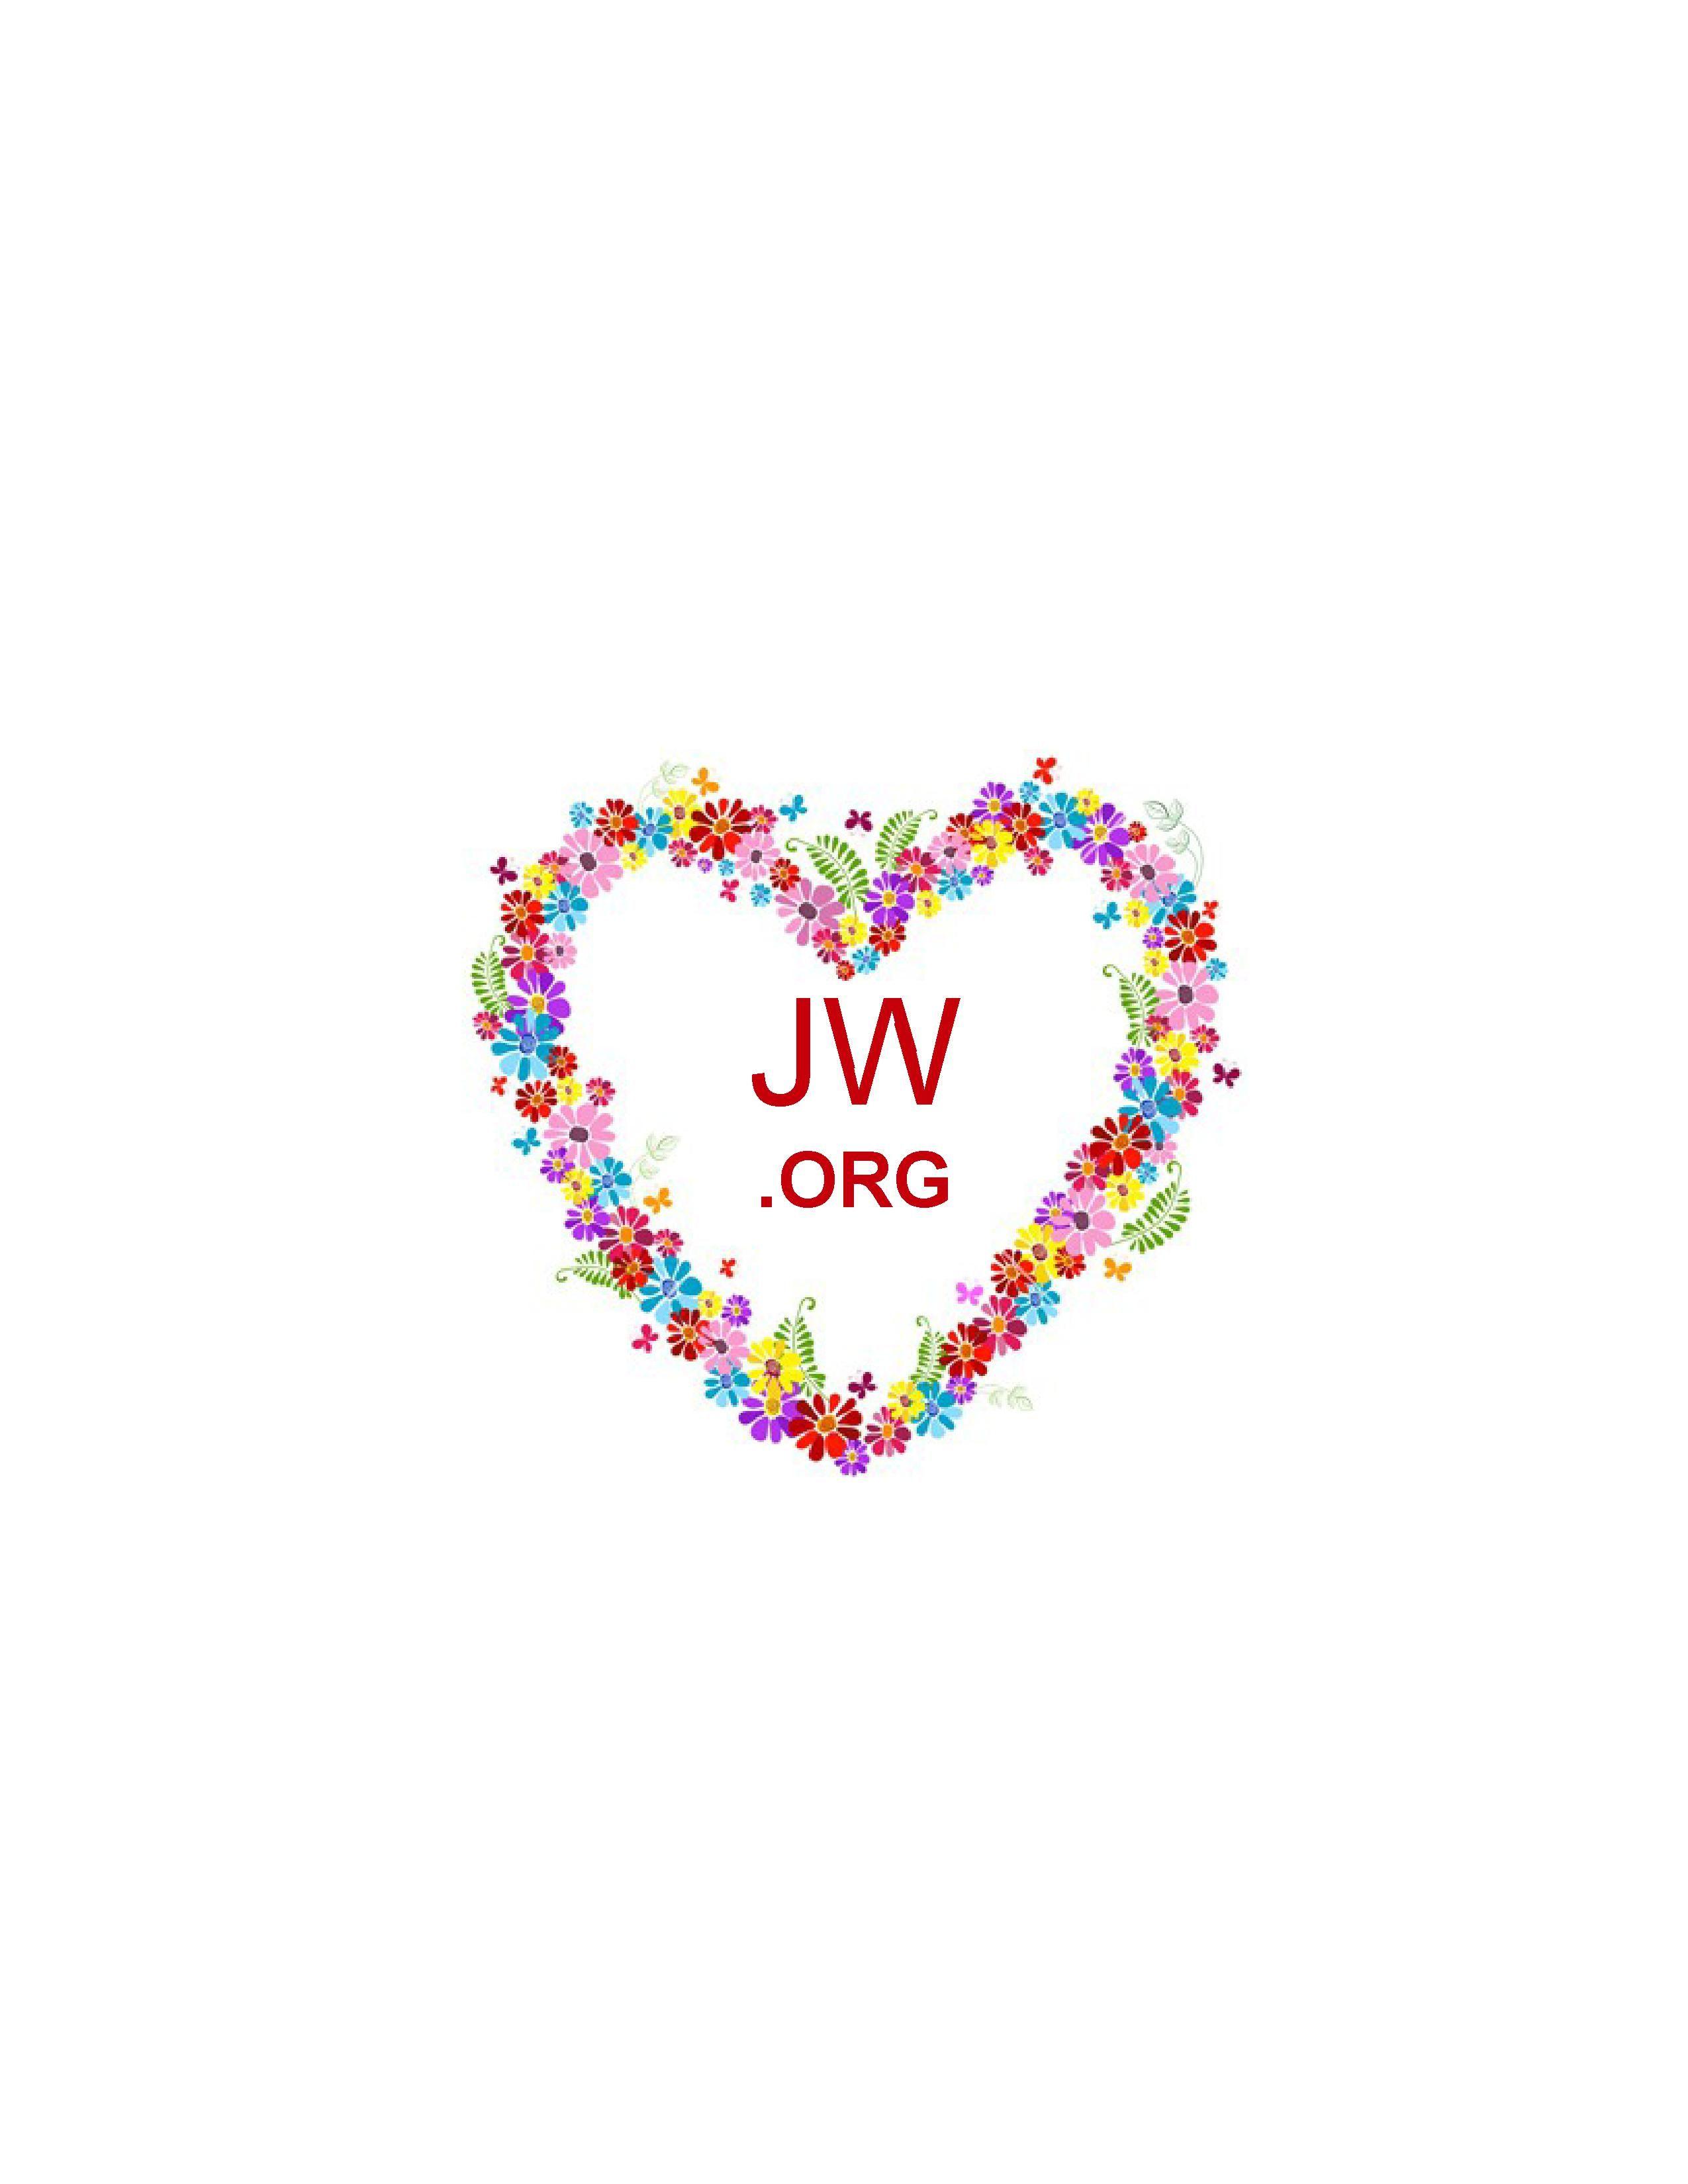 My First Jw Image